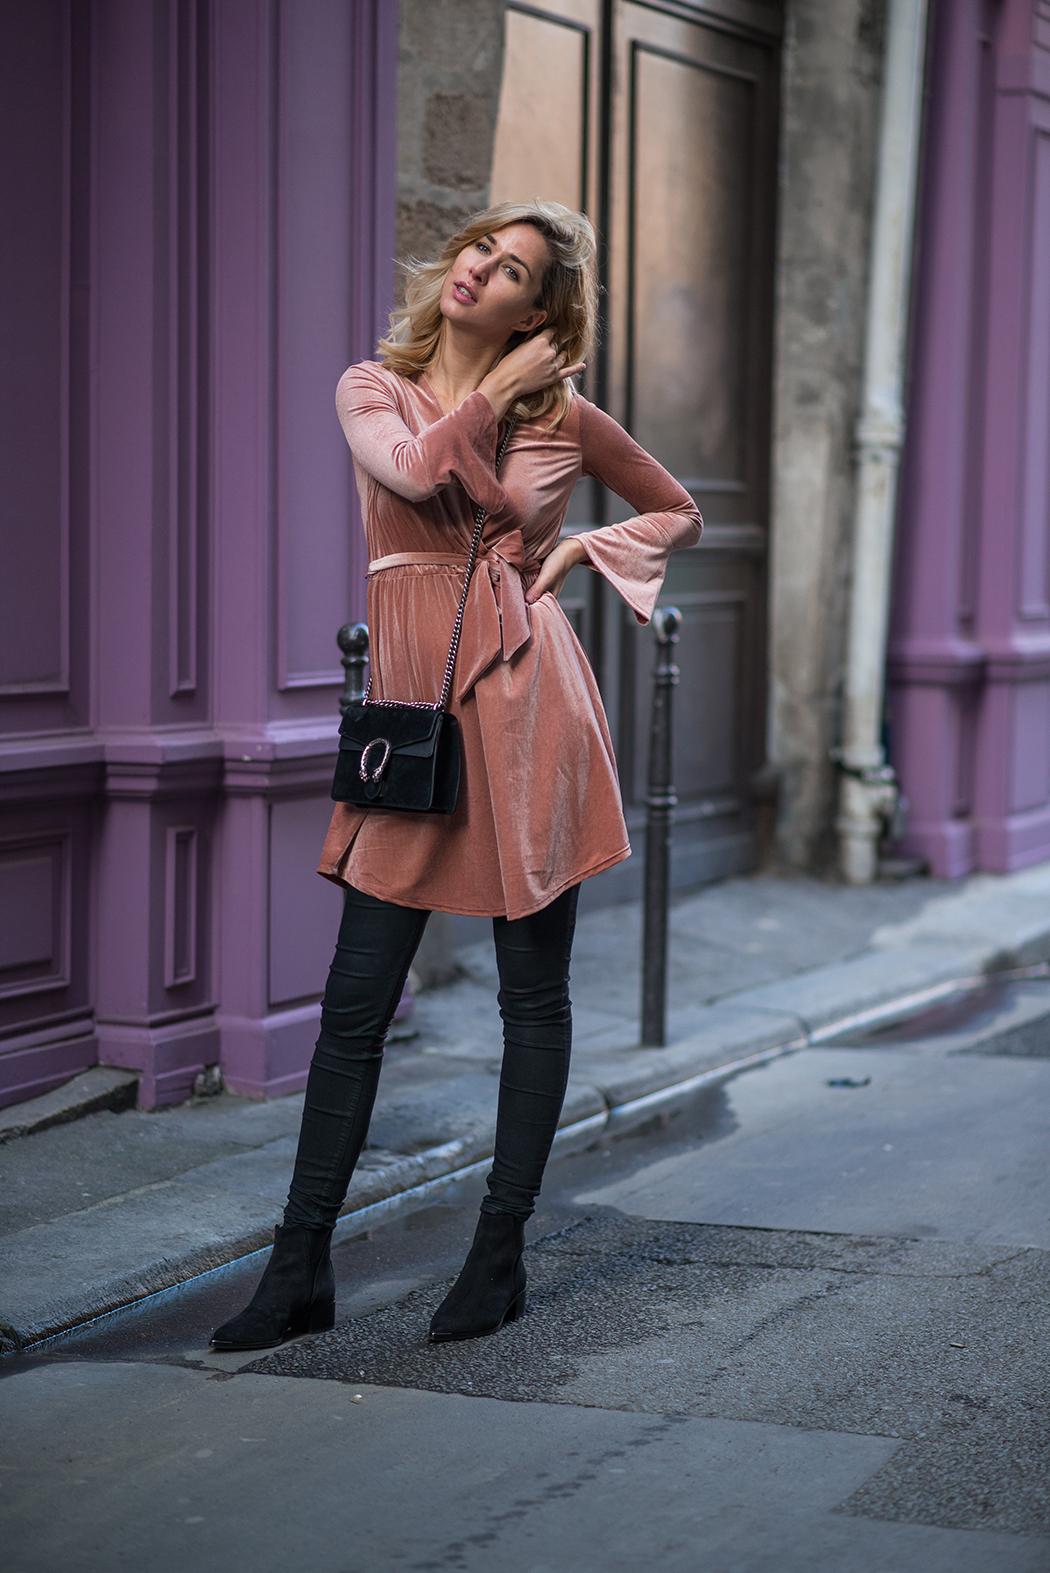 fashionblog-fashionblogger-fashion-blog-blogger-modeblogger-paris-samt-velvet-lindarella-8-web